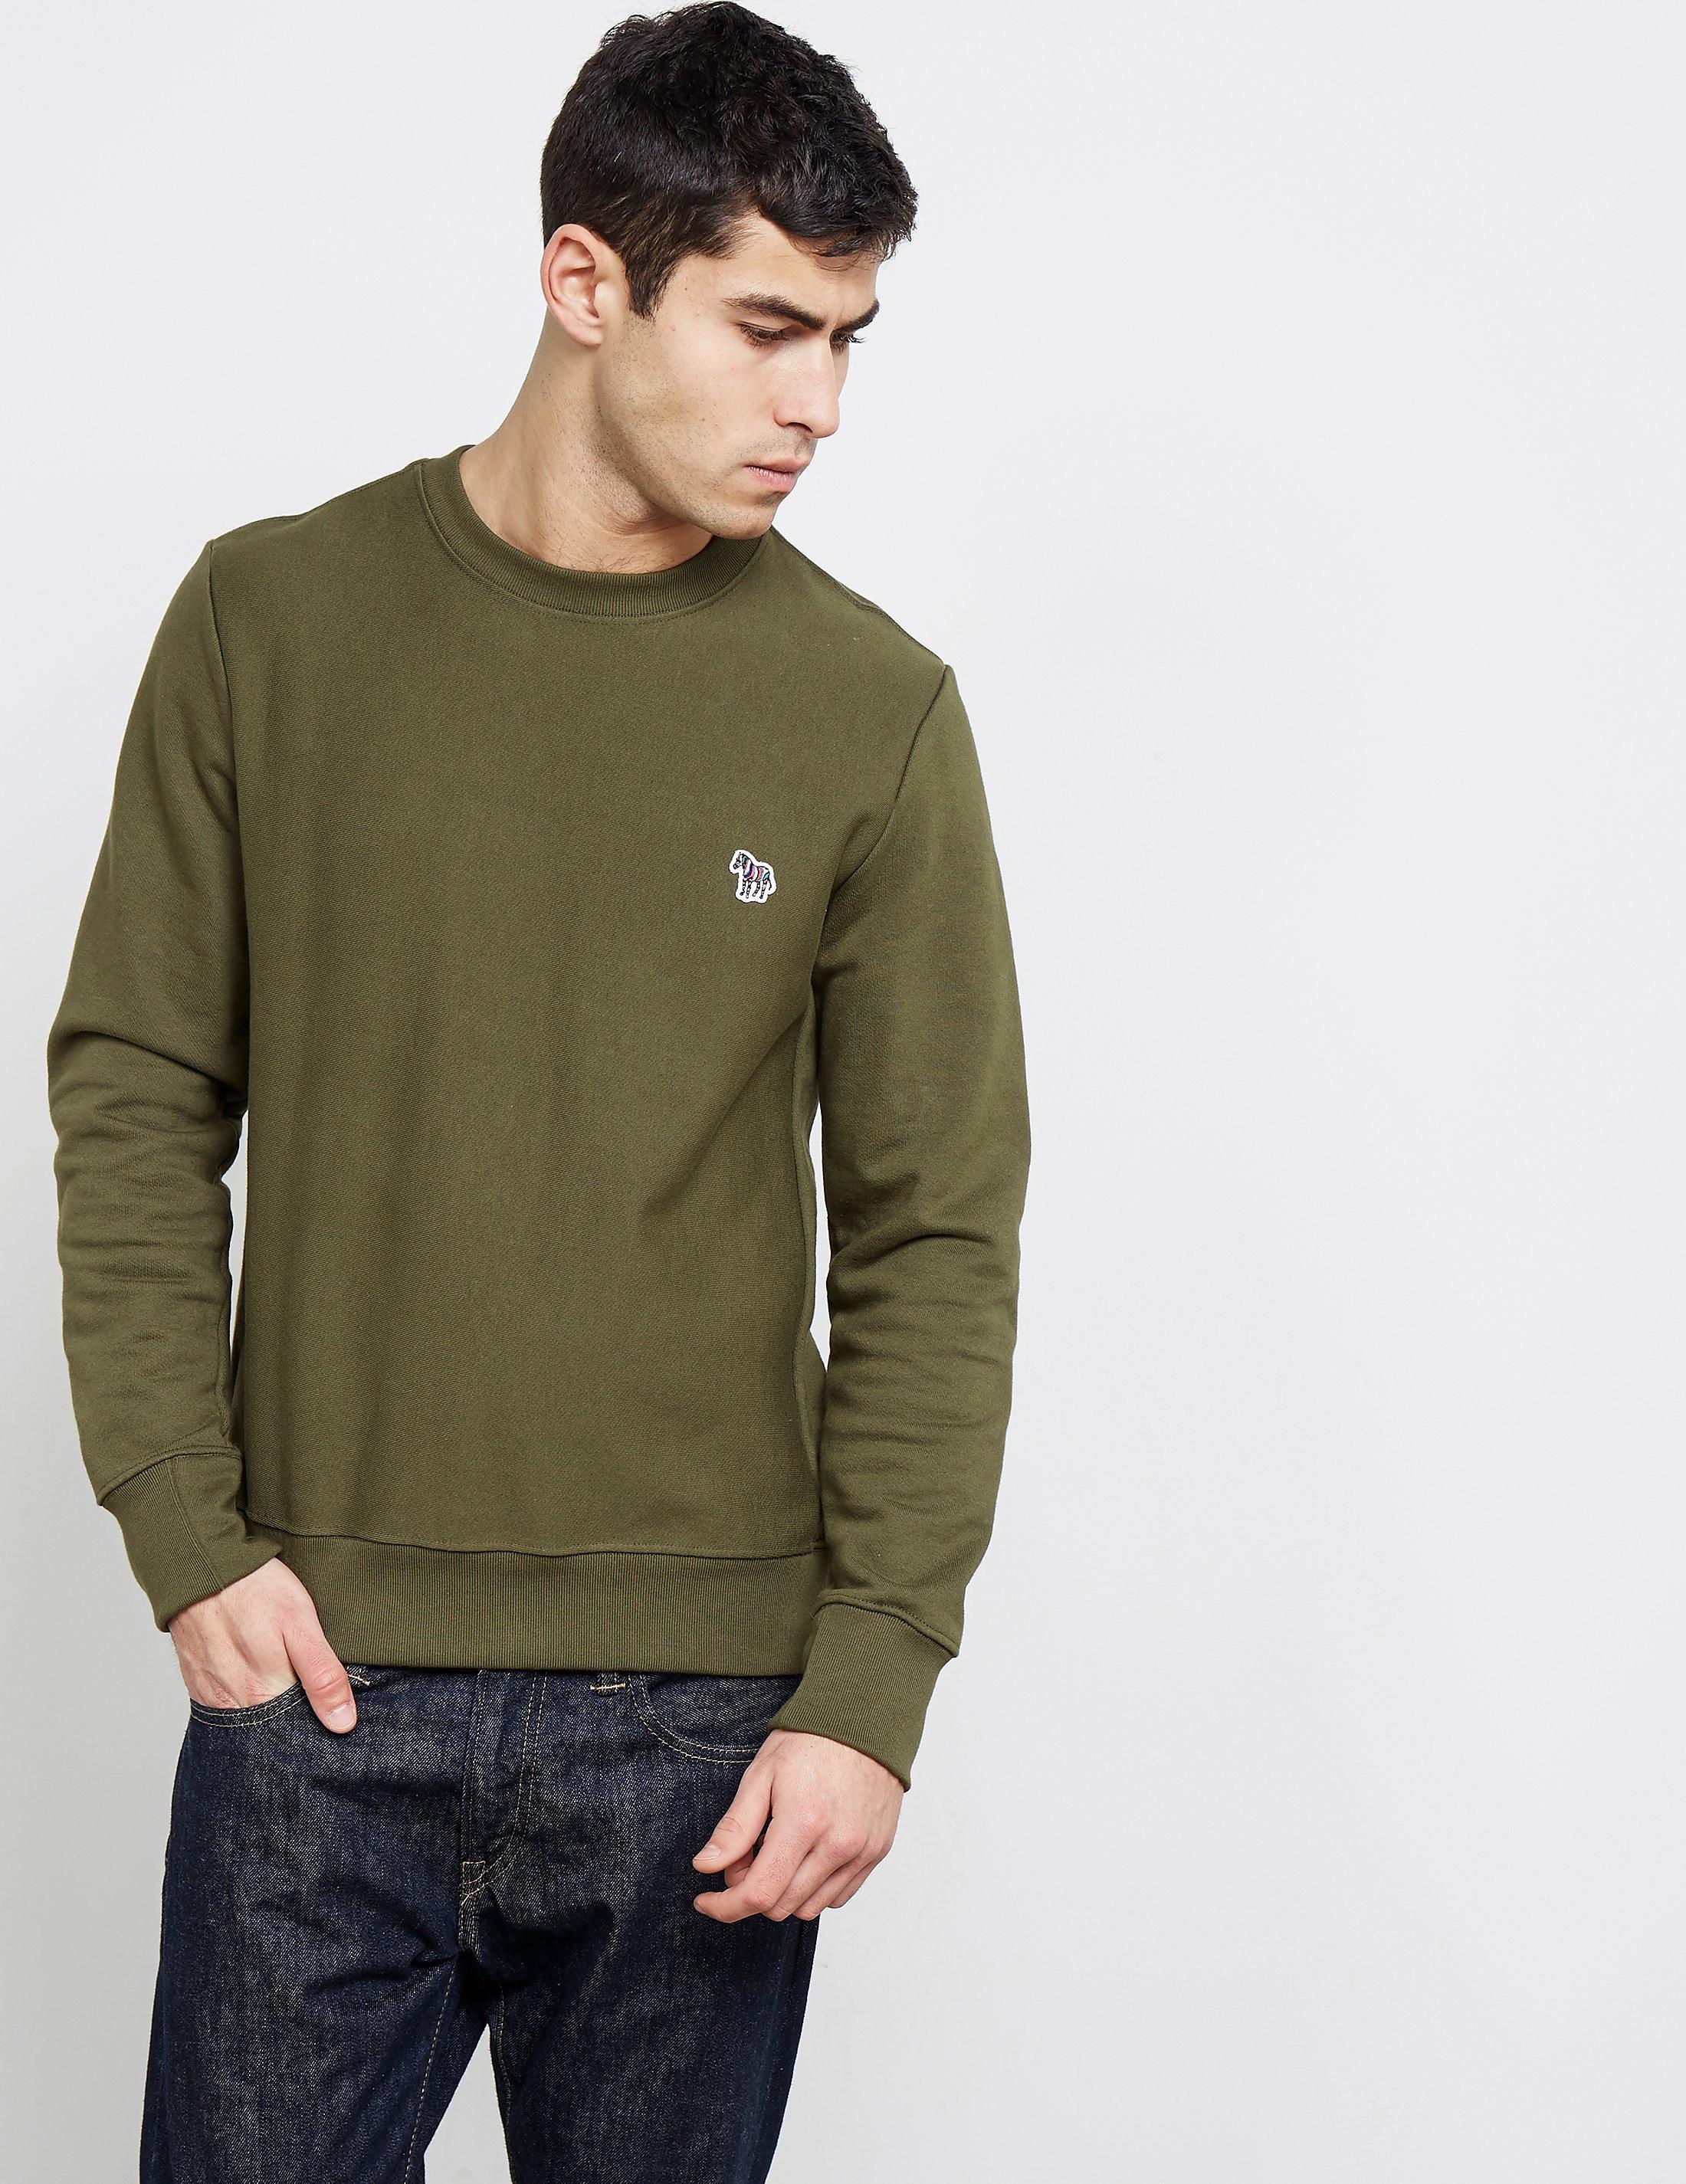 Paul Smith Zebra Crew Sweatshirt